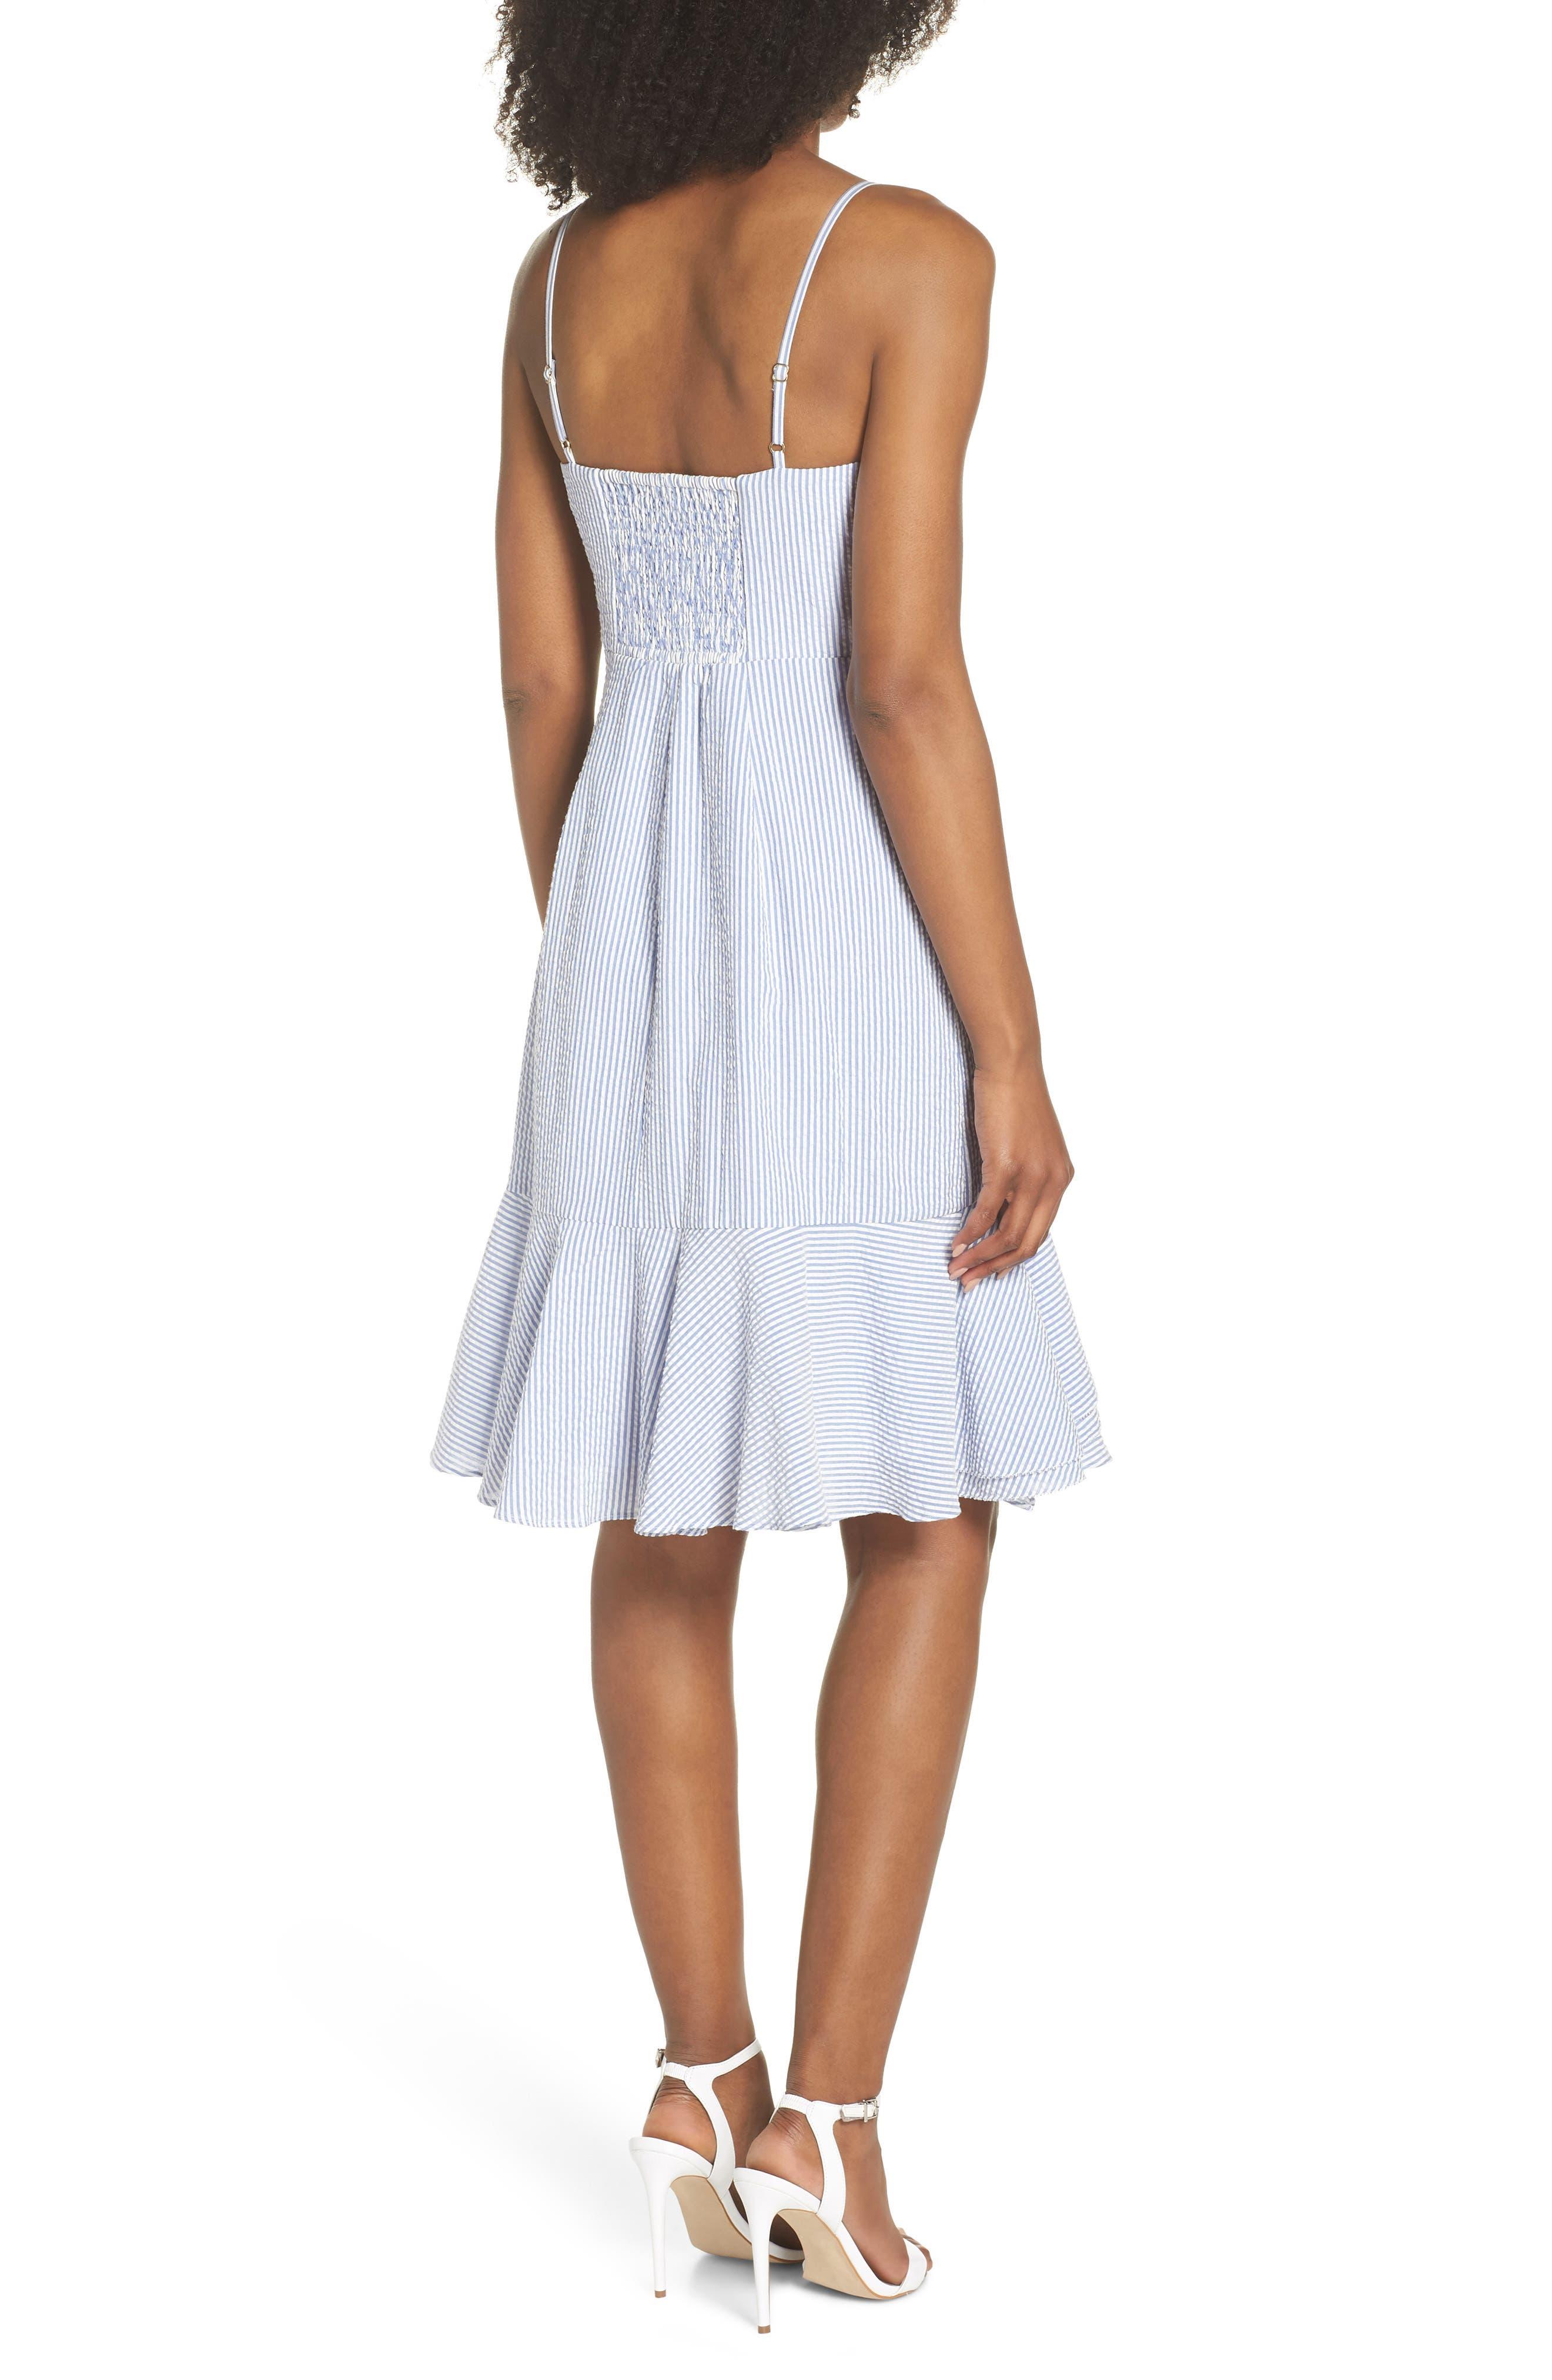 J.Crew Spaghetti Strap Ruffle Dress,                             Alternate thumbnail 2, color,                             Blue White